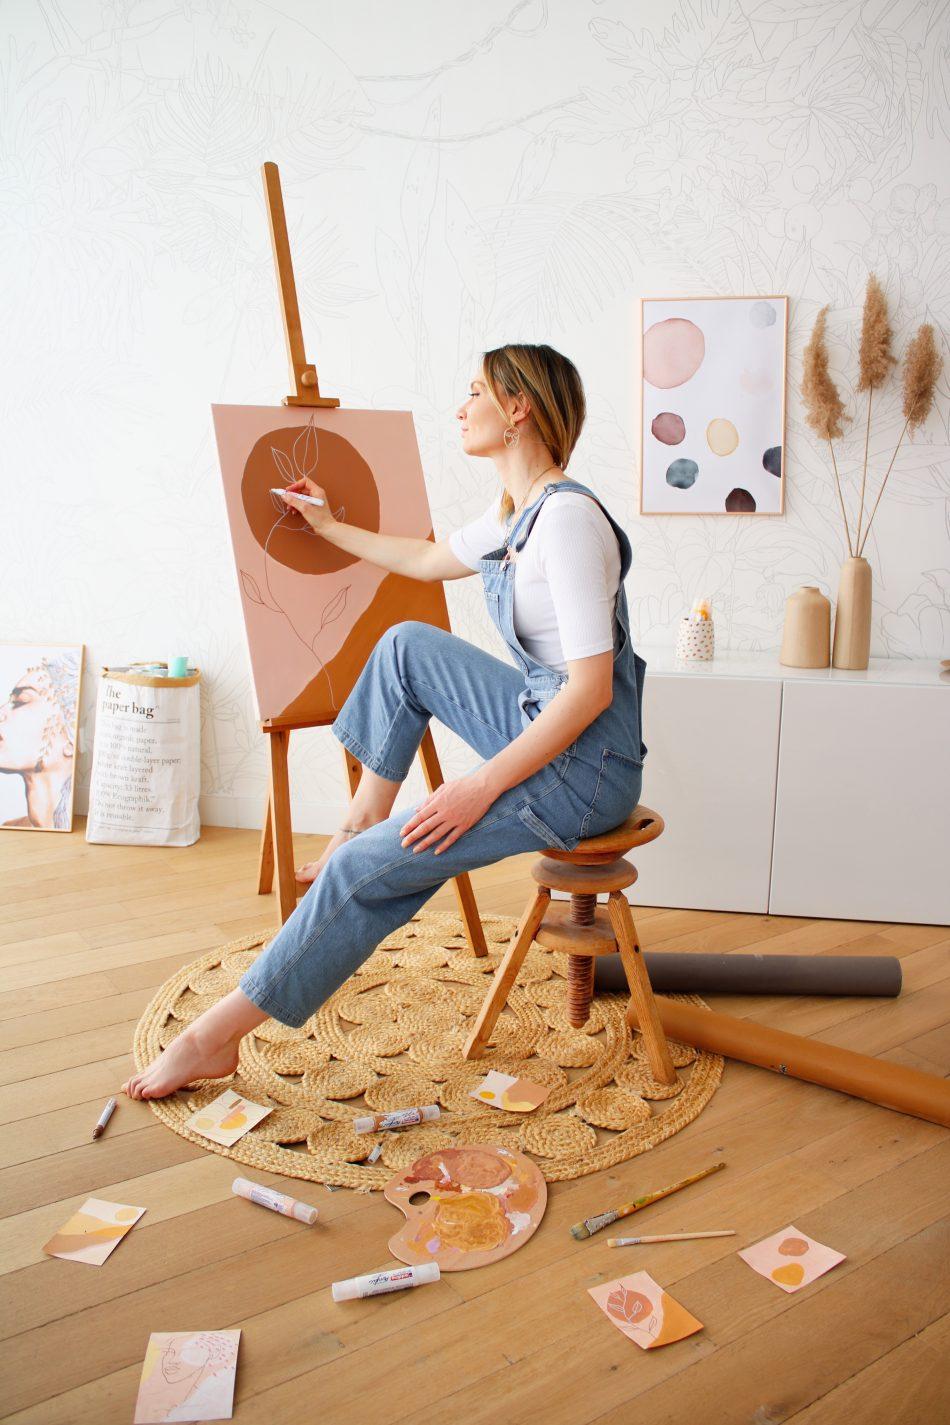 DIY-peinture-facile-acrylique-edding-artlex